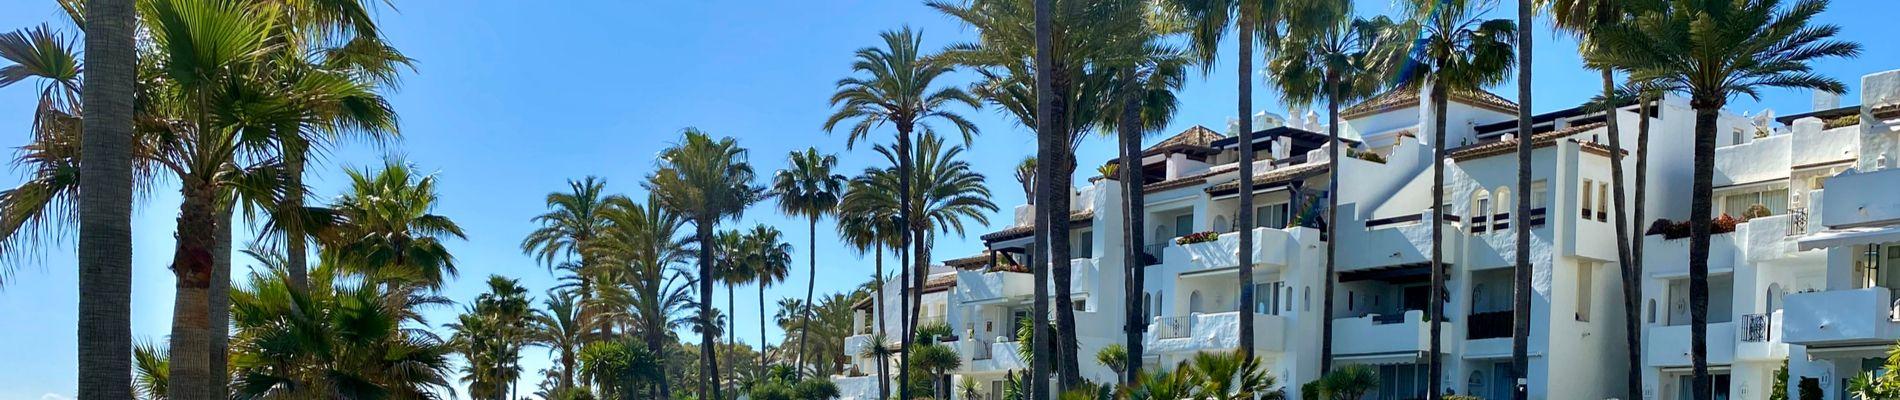 off-plan property in Spain